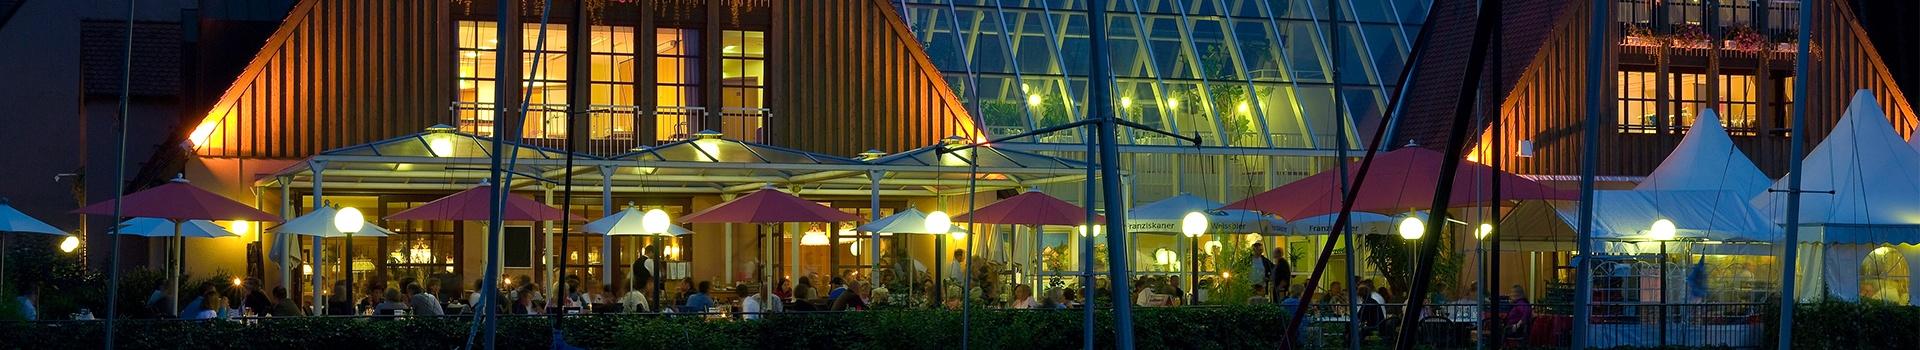 Aktivresort Strandhotel Seehof am Abend, Terrasse